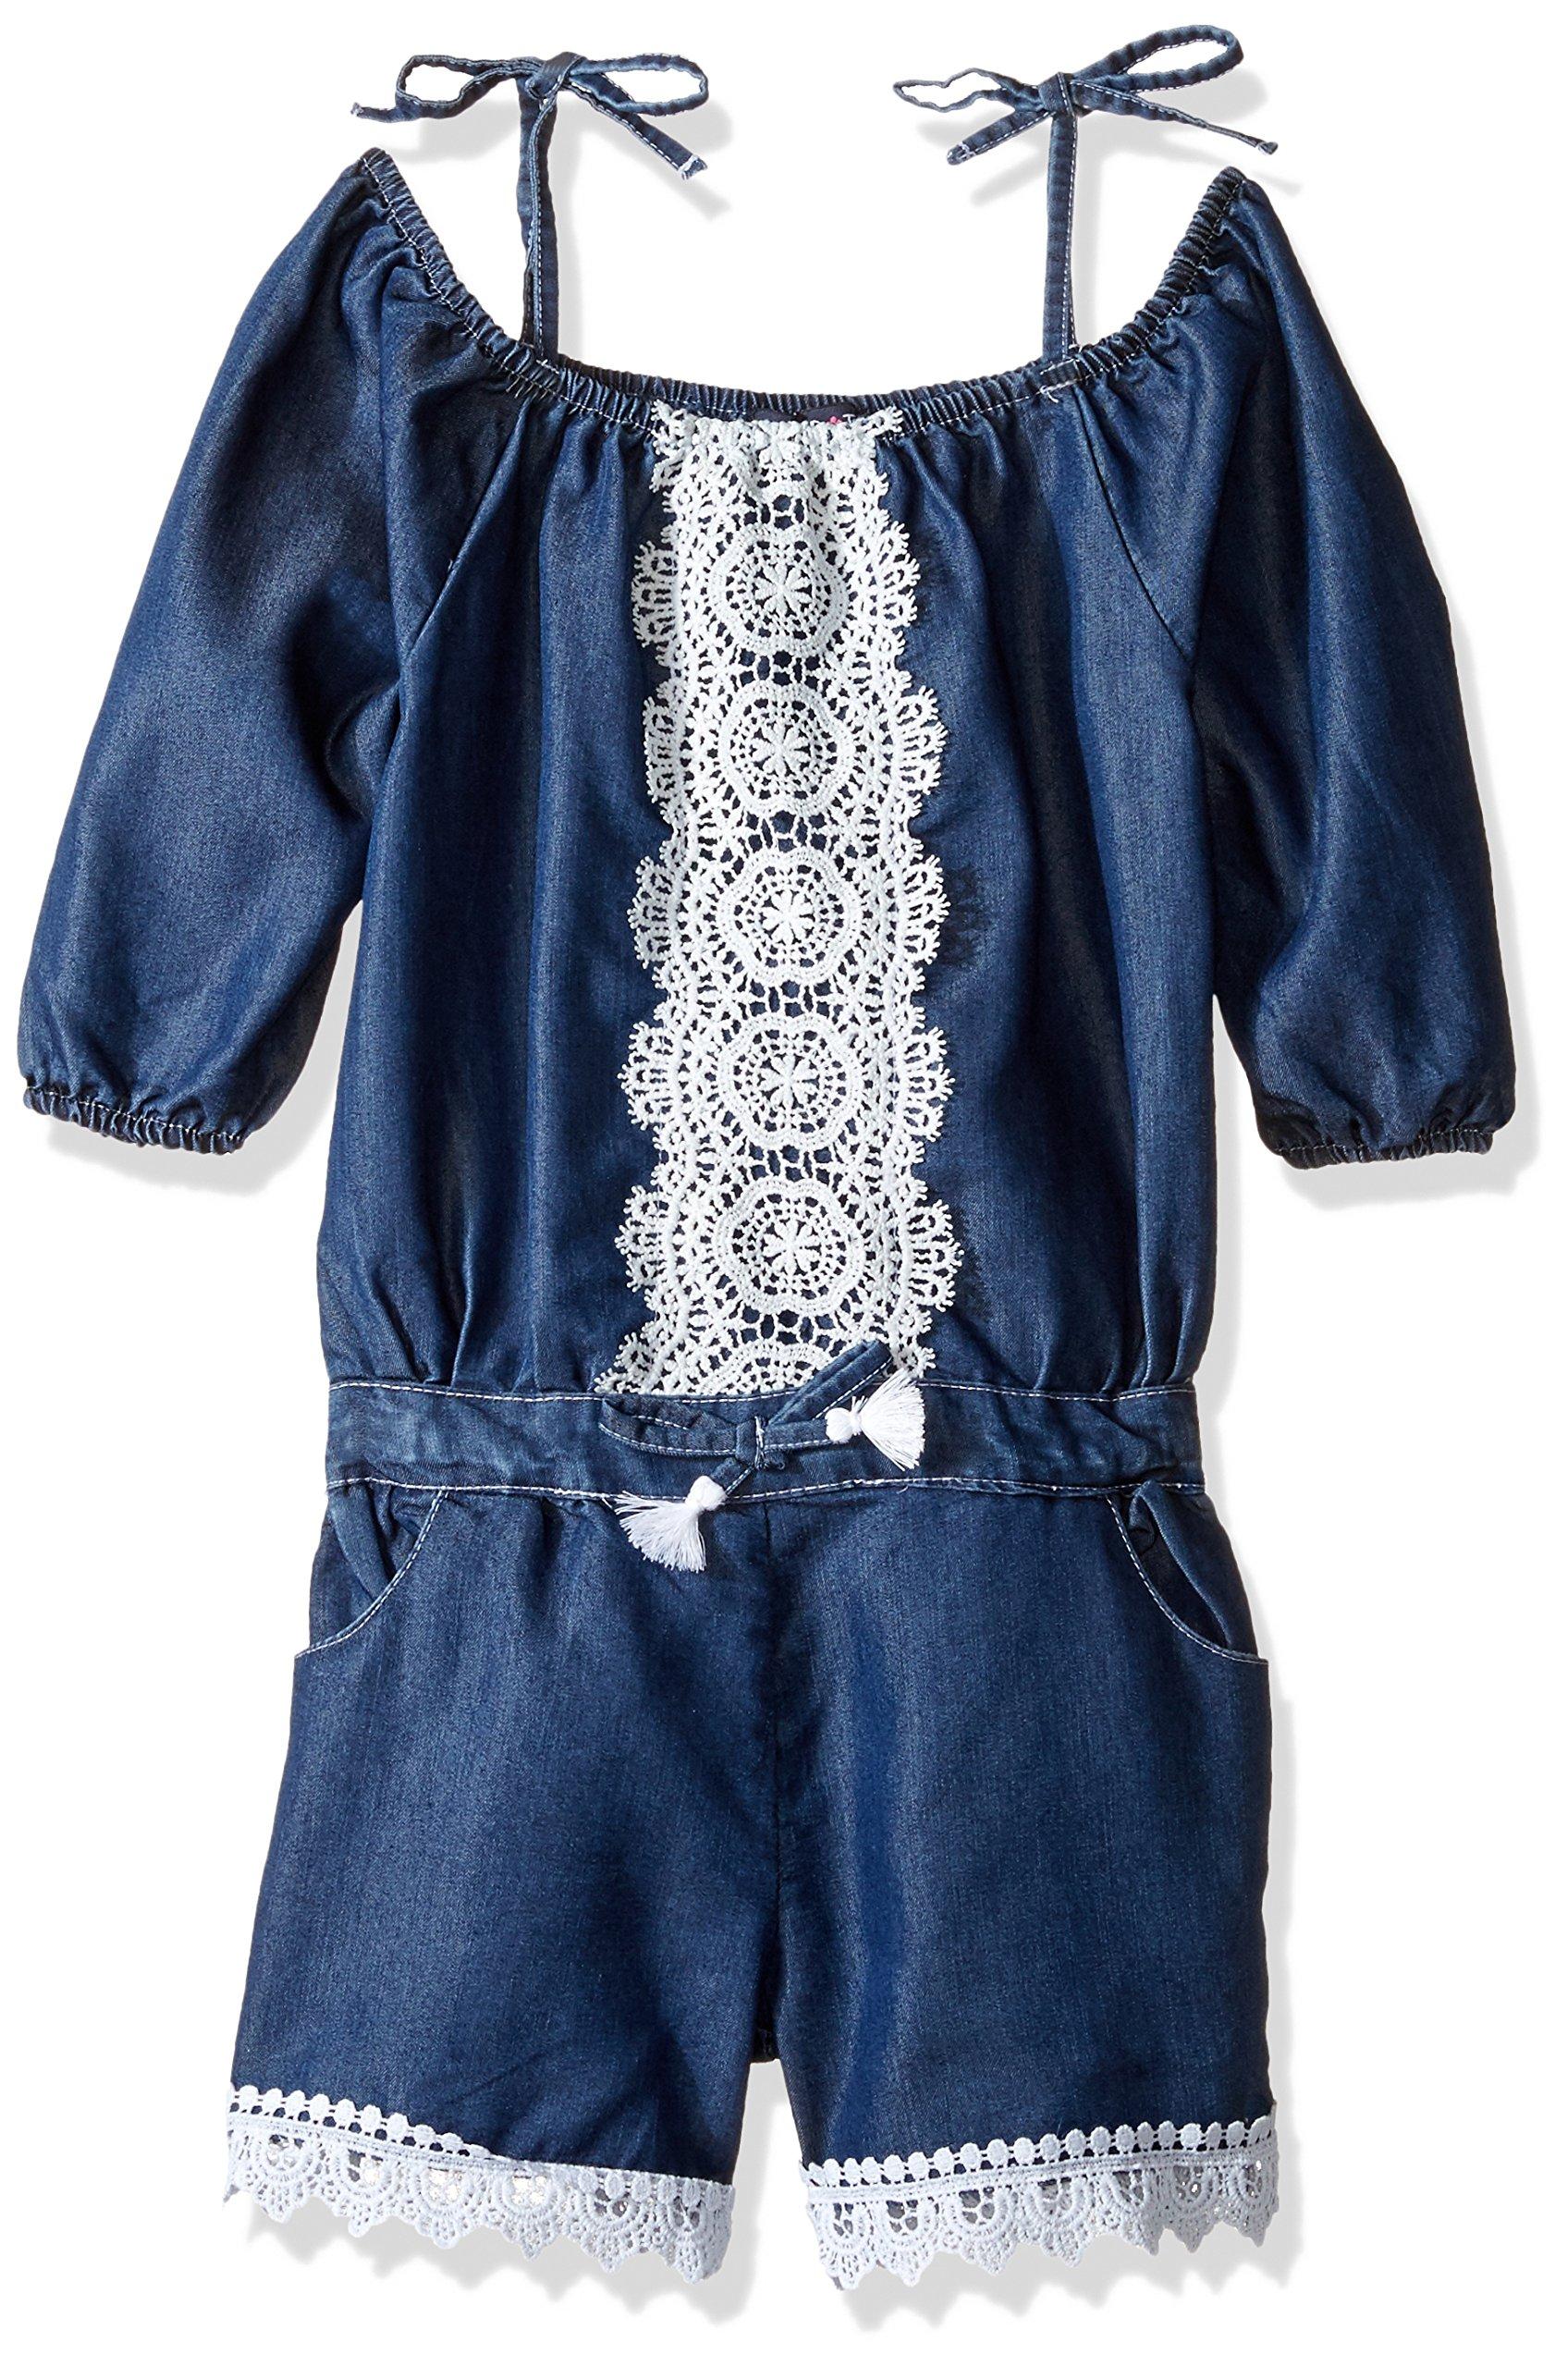 Limited Too Girls' Fashion Short Romper, 2740-Medium Blue Denim, 5/6